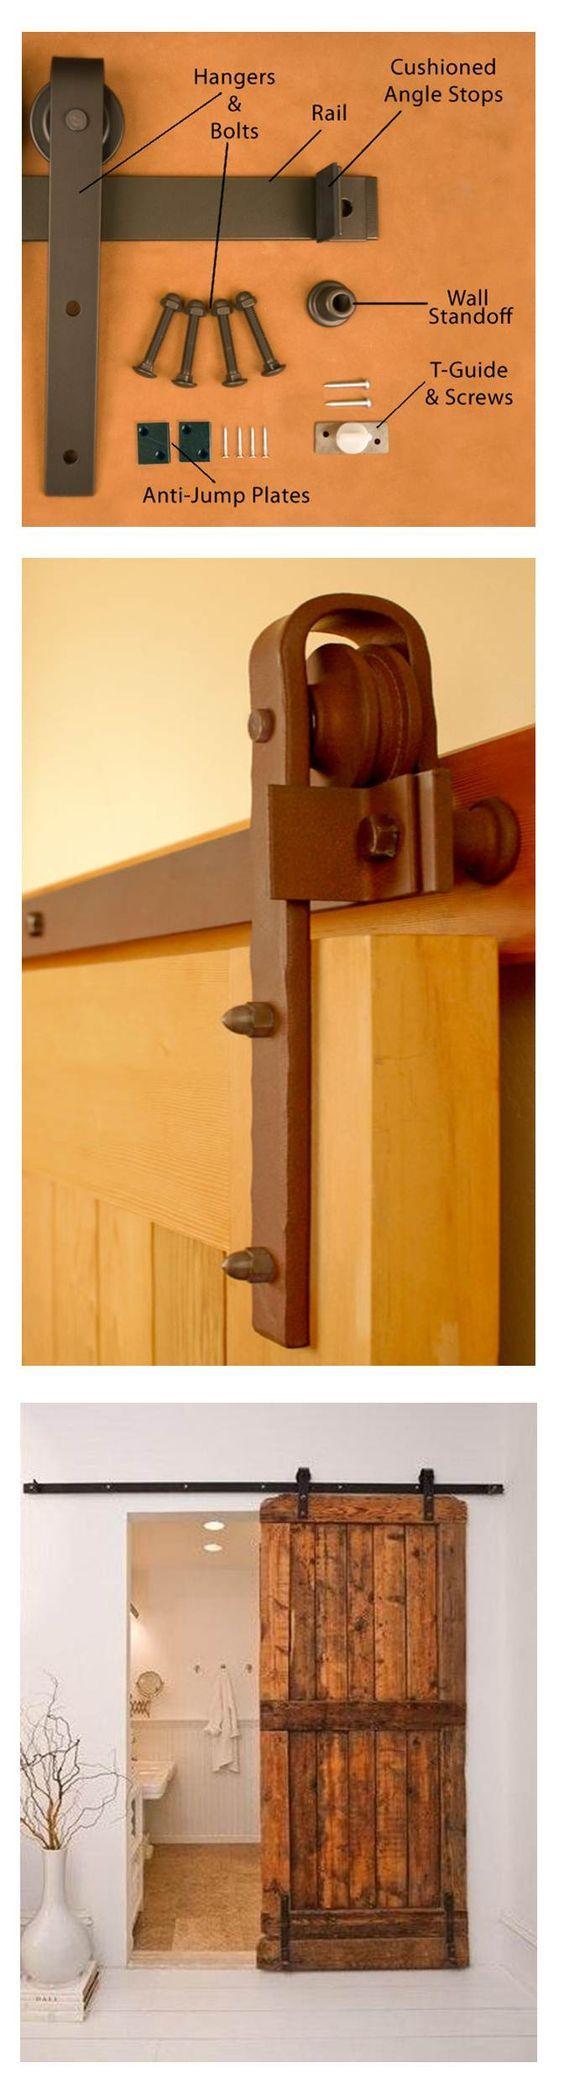 Simple DIY Furniture Transformation - 9.Sliding Barn Door Hardware - Diy & Crafts Ideas Magazine